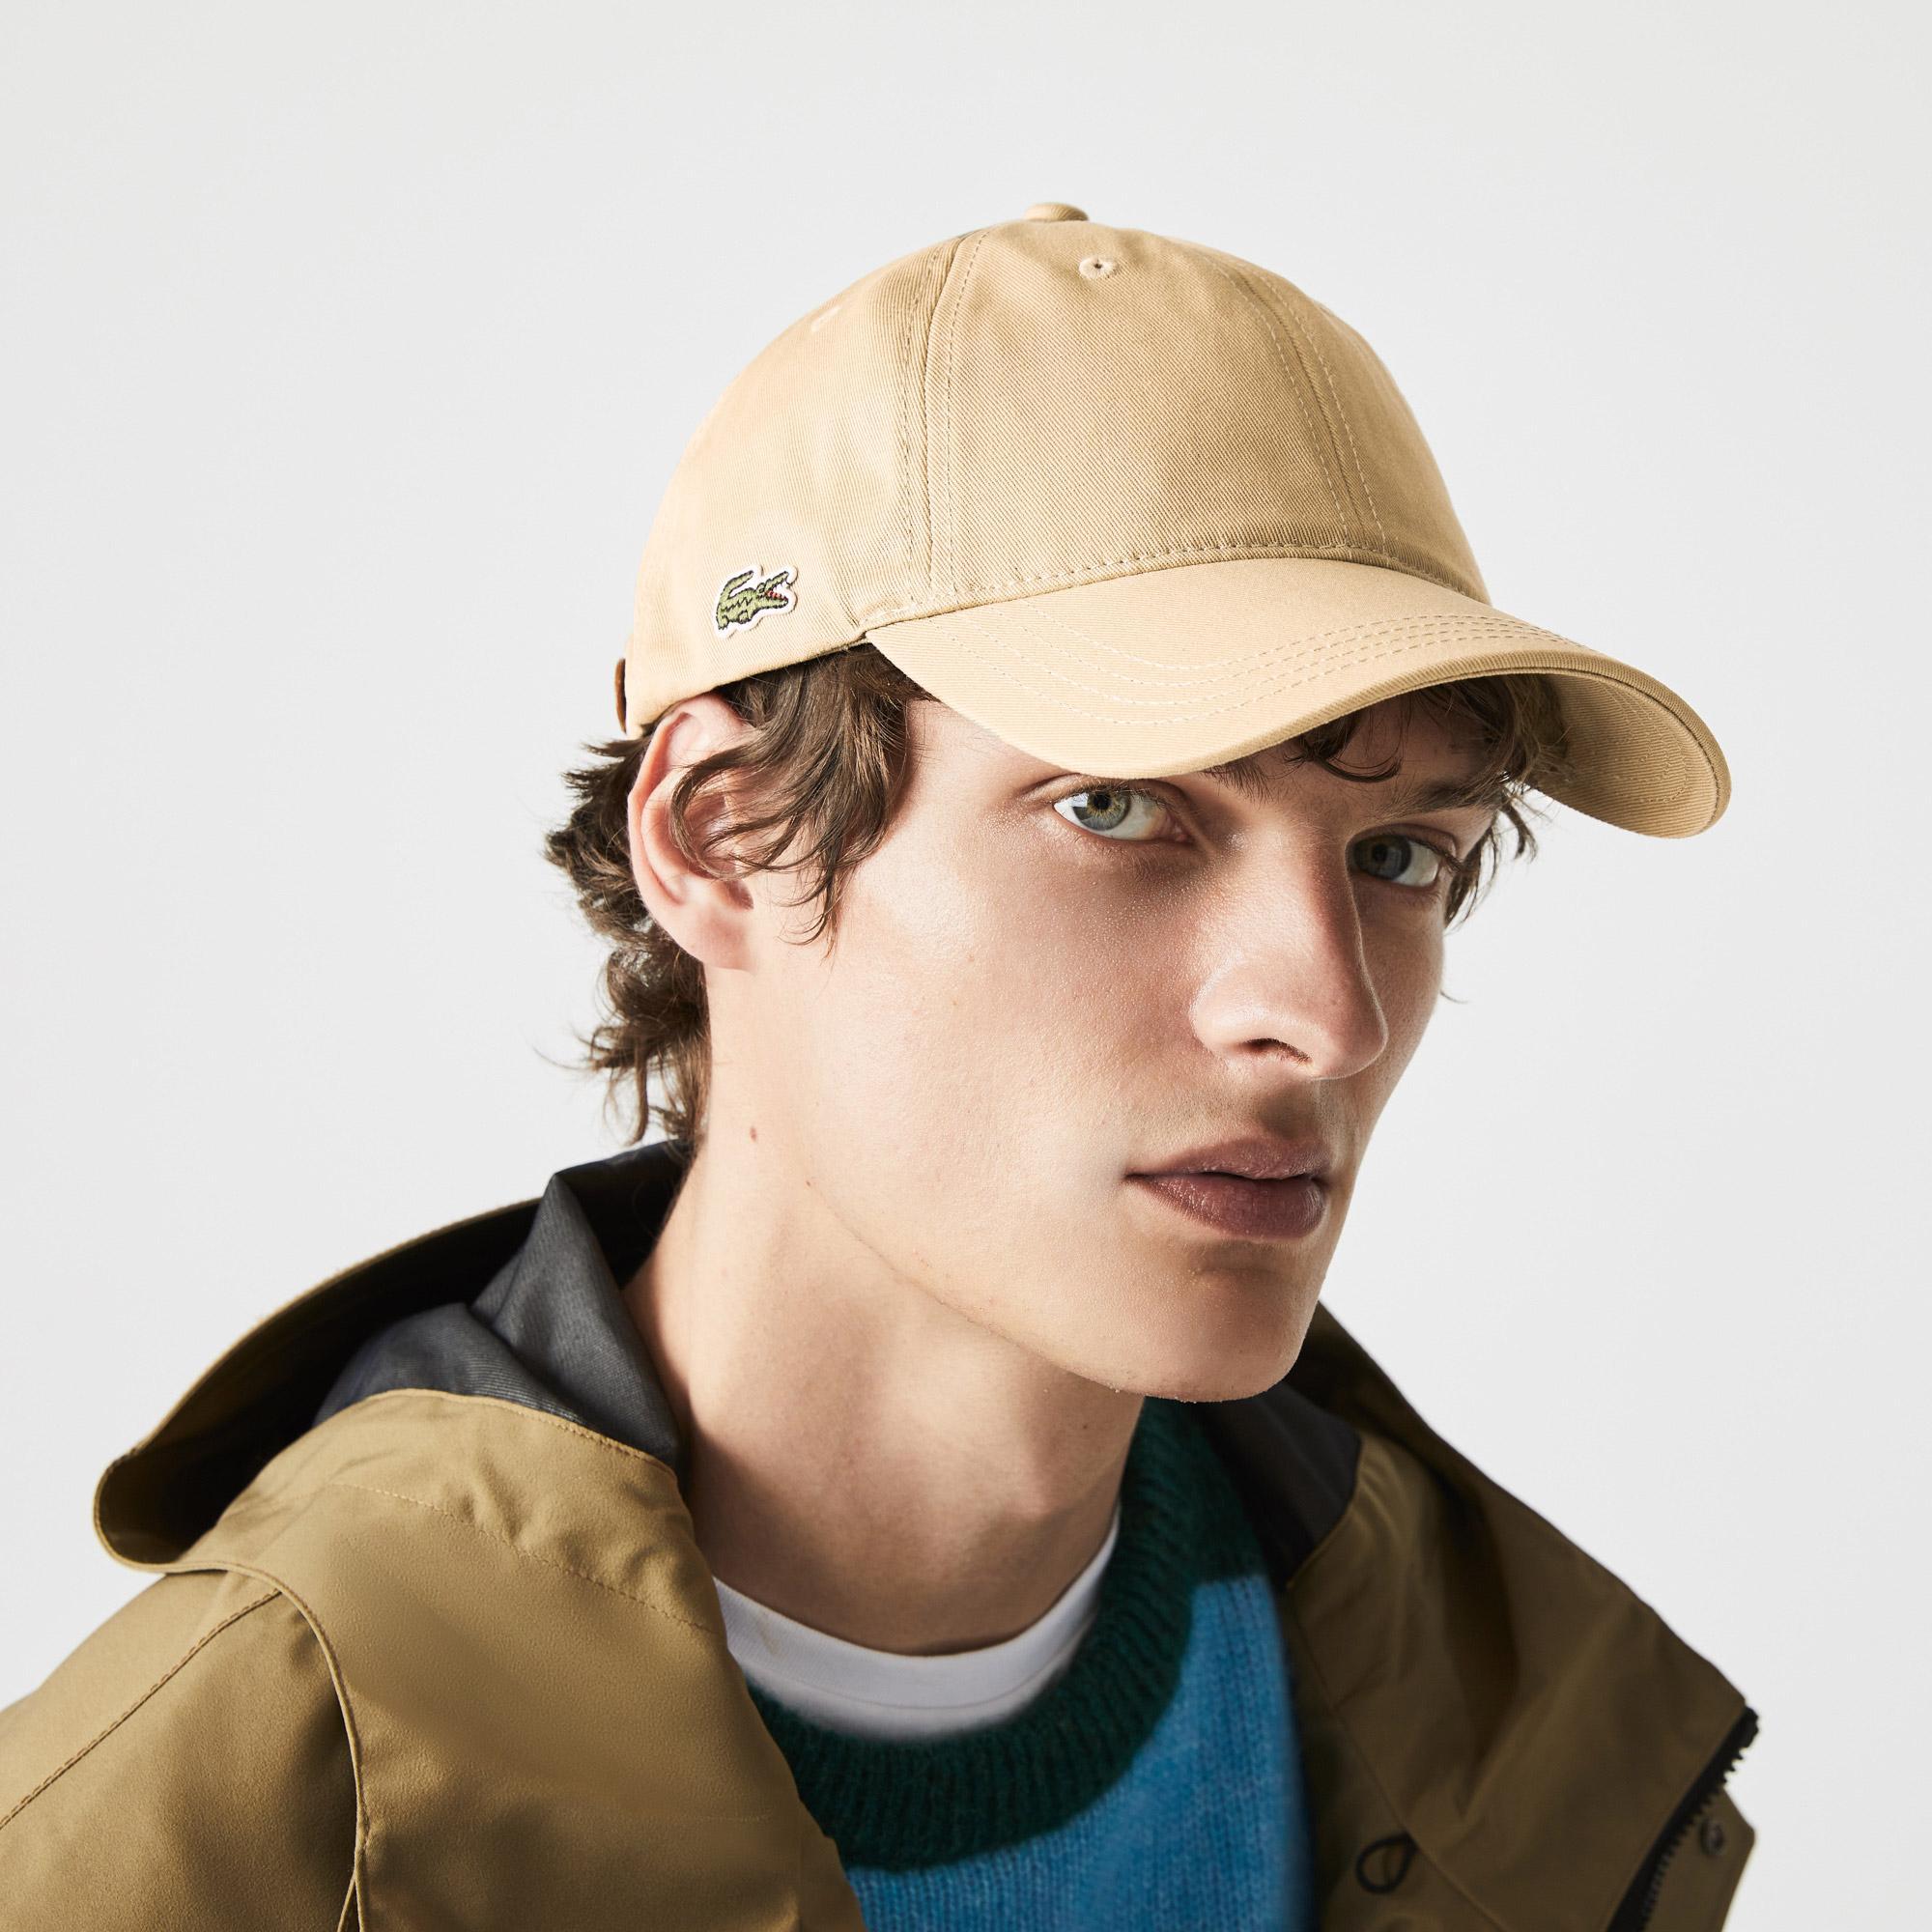 Lacoste Erkek Açık Kahverengi Şapka